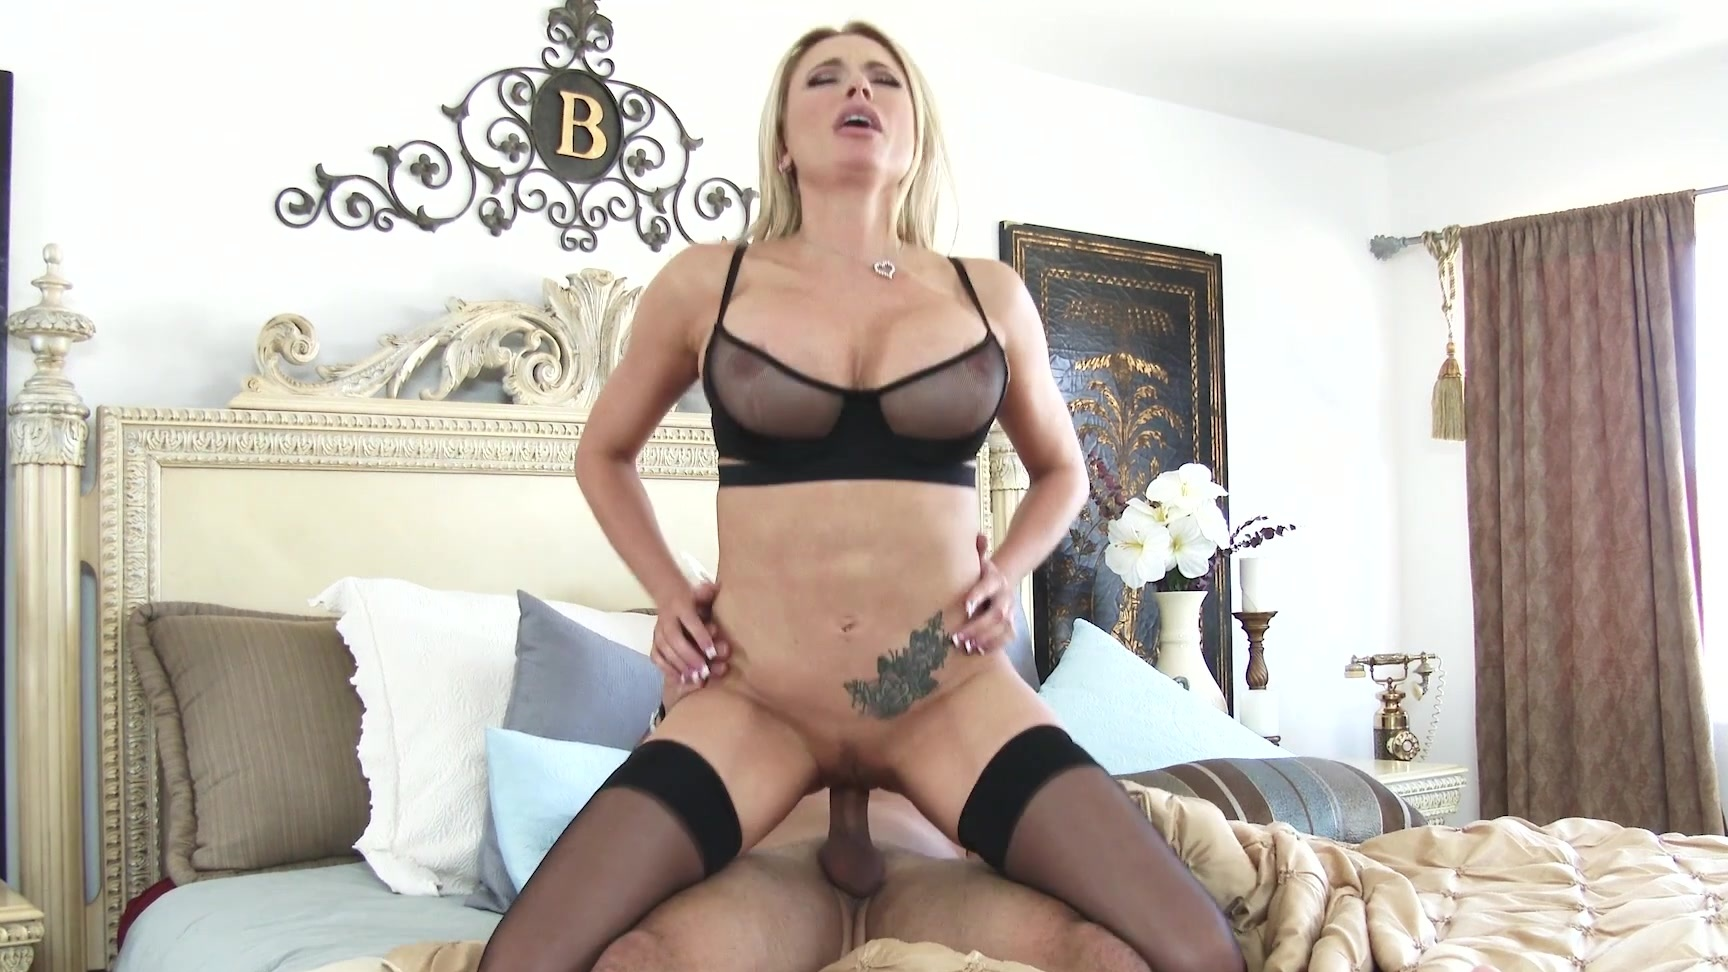 Briana banks sexiest fucks